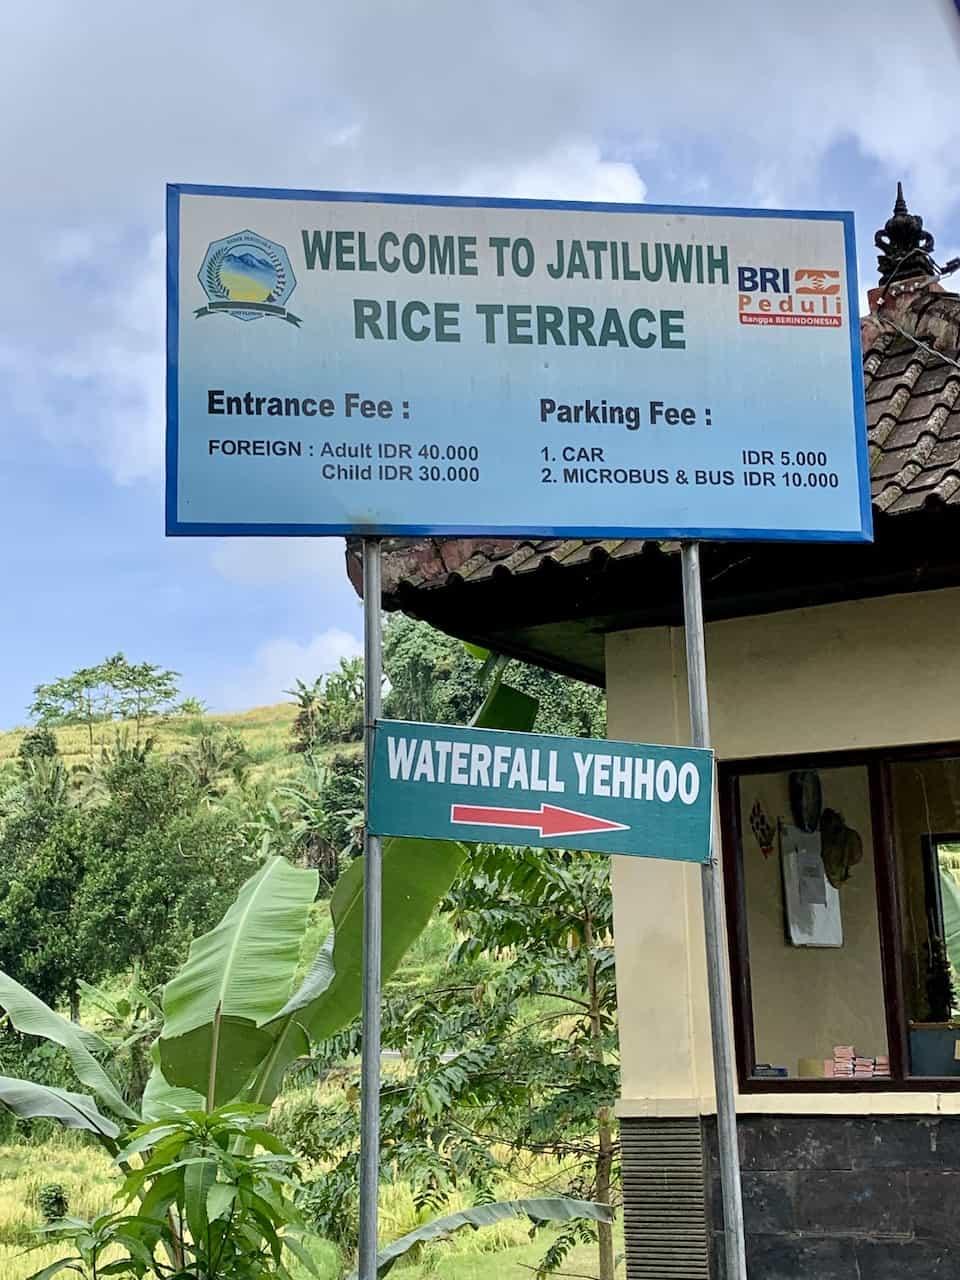 Jatiluwih Rice Terraces Entrance